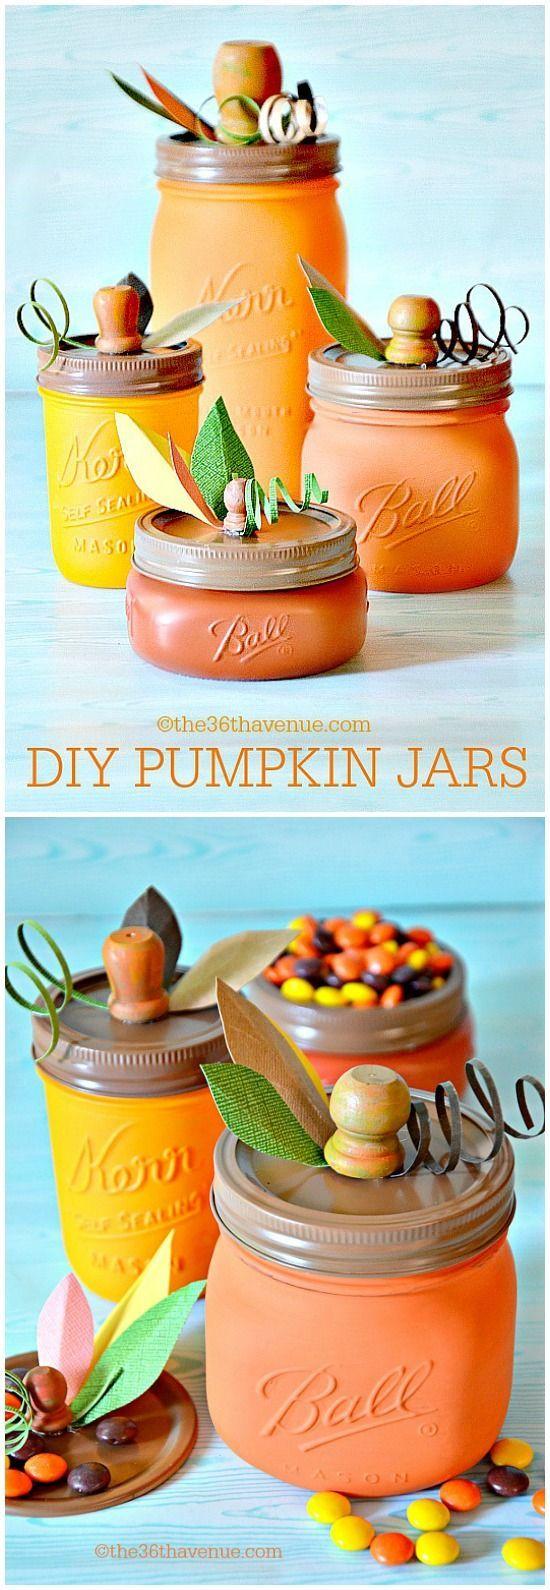 Crafts : DIY Pumpkin Jar Tutorial. Super cute and easy to make!